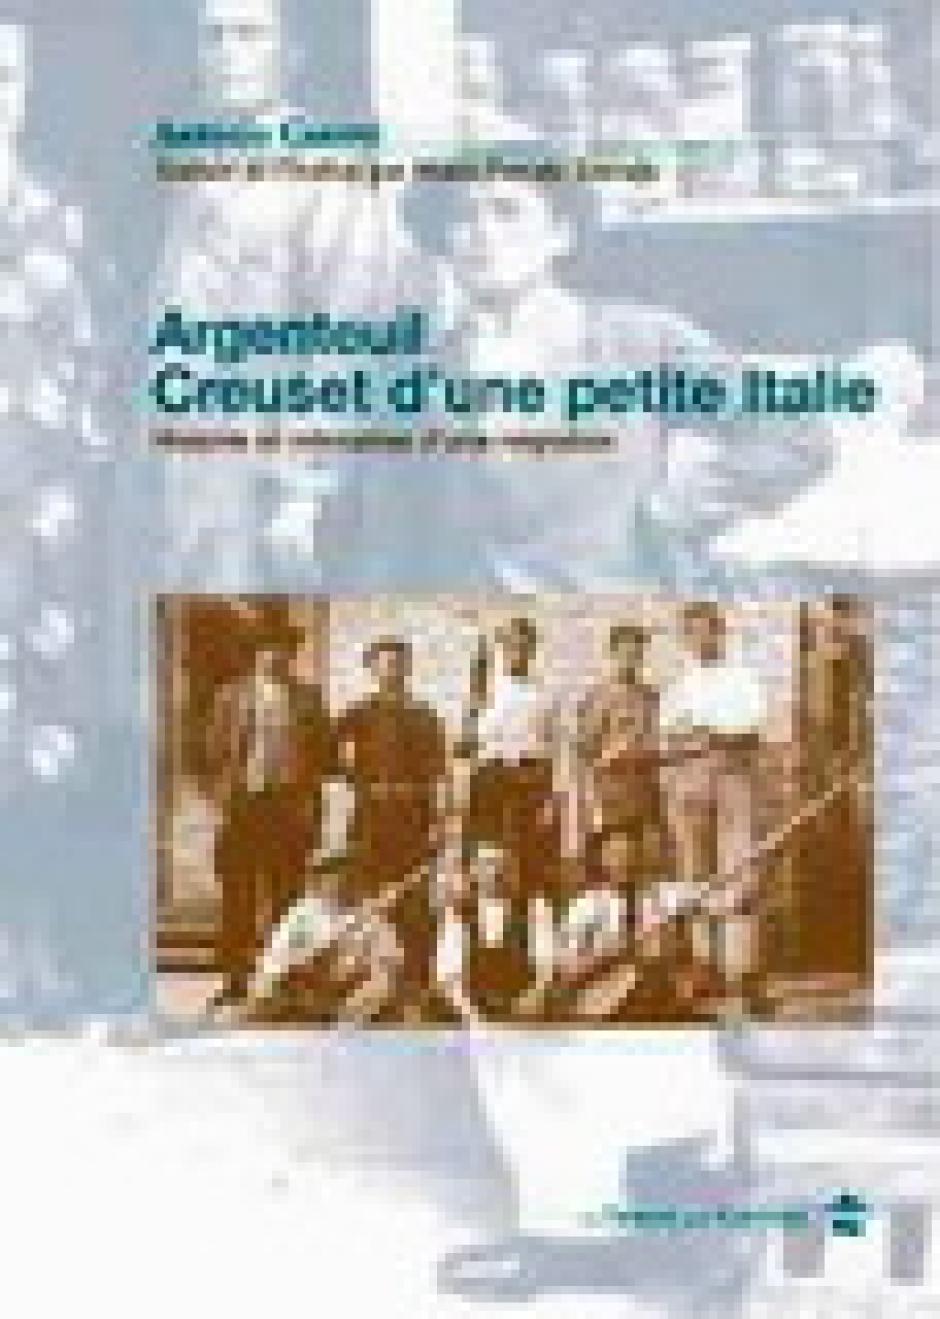 Argenteuil, creuset d'une petite Italie. Antonio Canovi